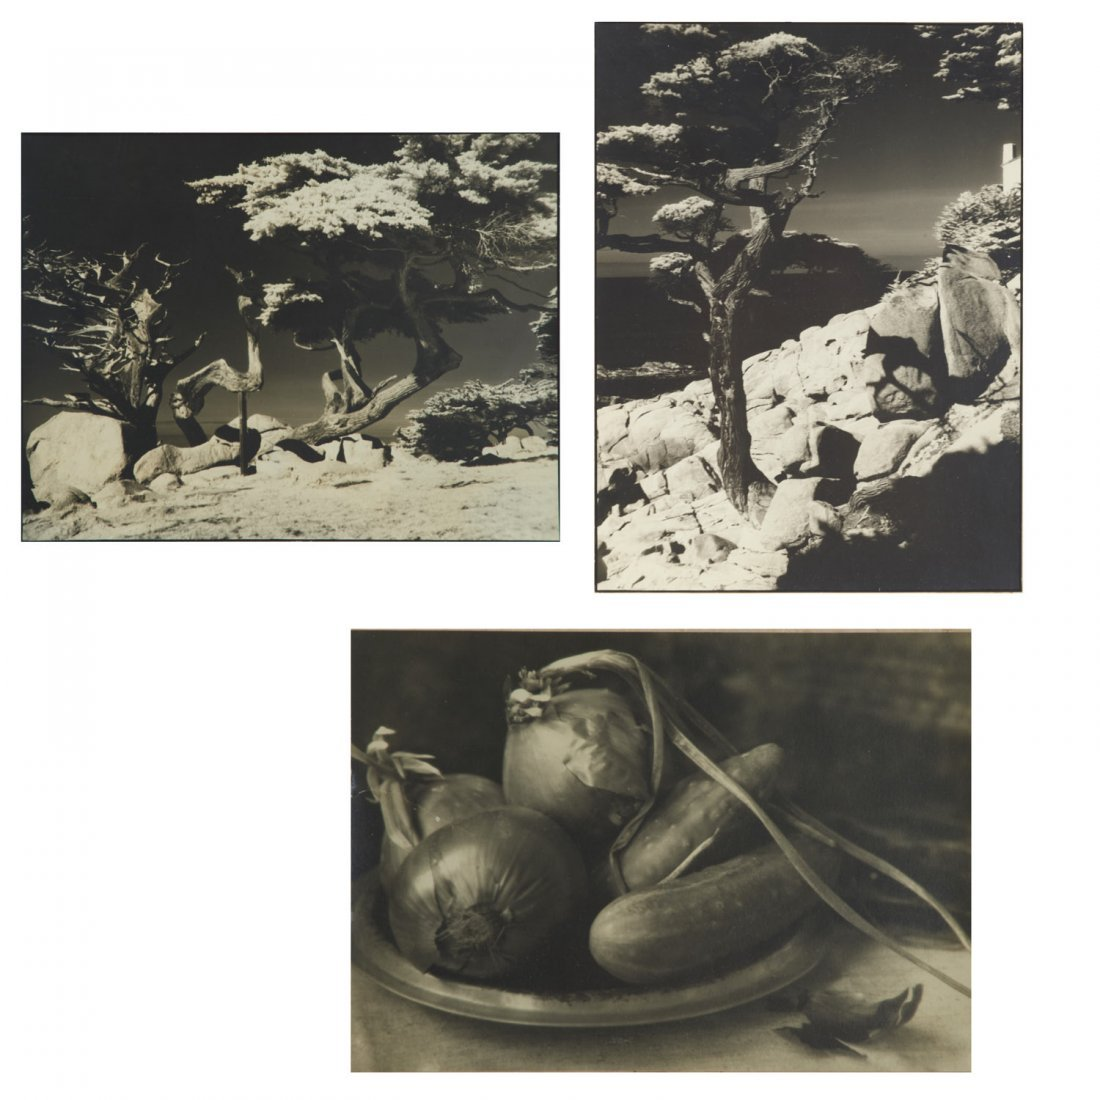 William T. Higbee, (3) photograph prints